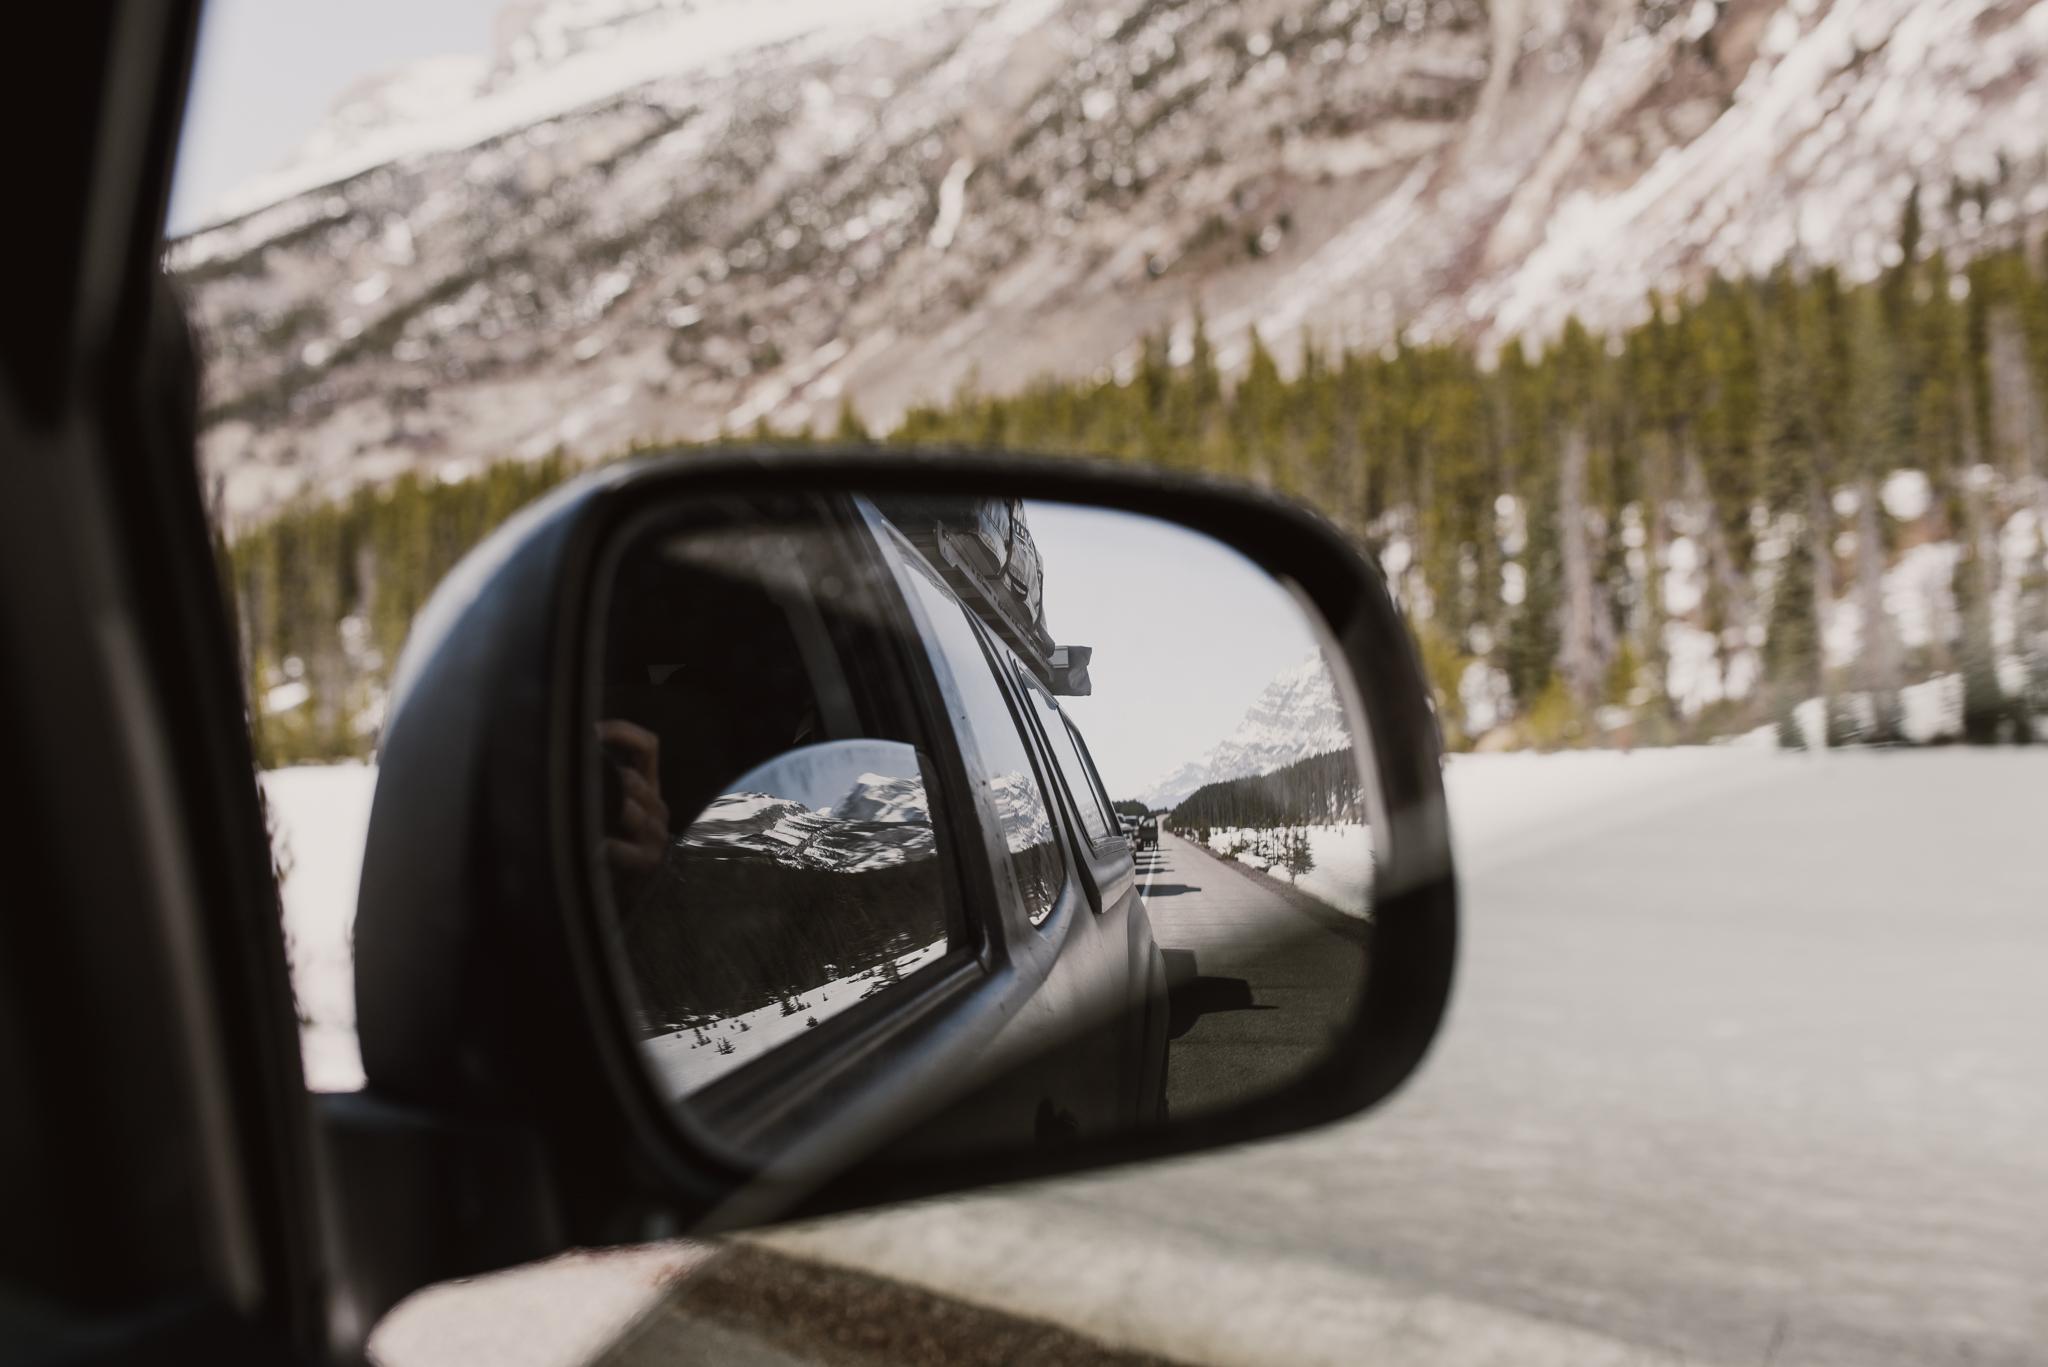 ©The-Ryans-Photo---Athabasca-Glacier,-Ice-Cave-004.jpg